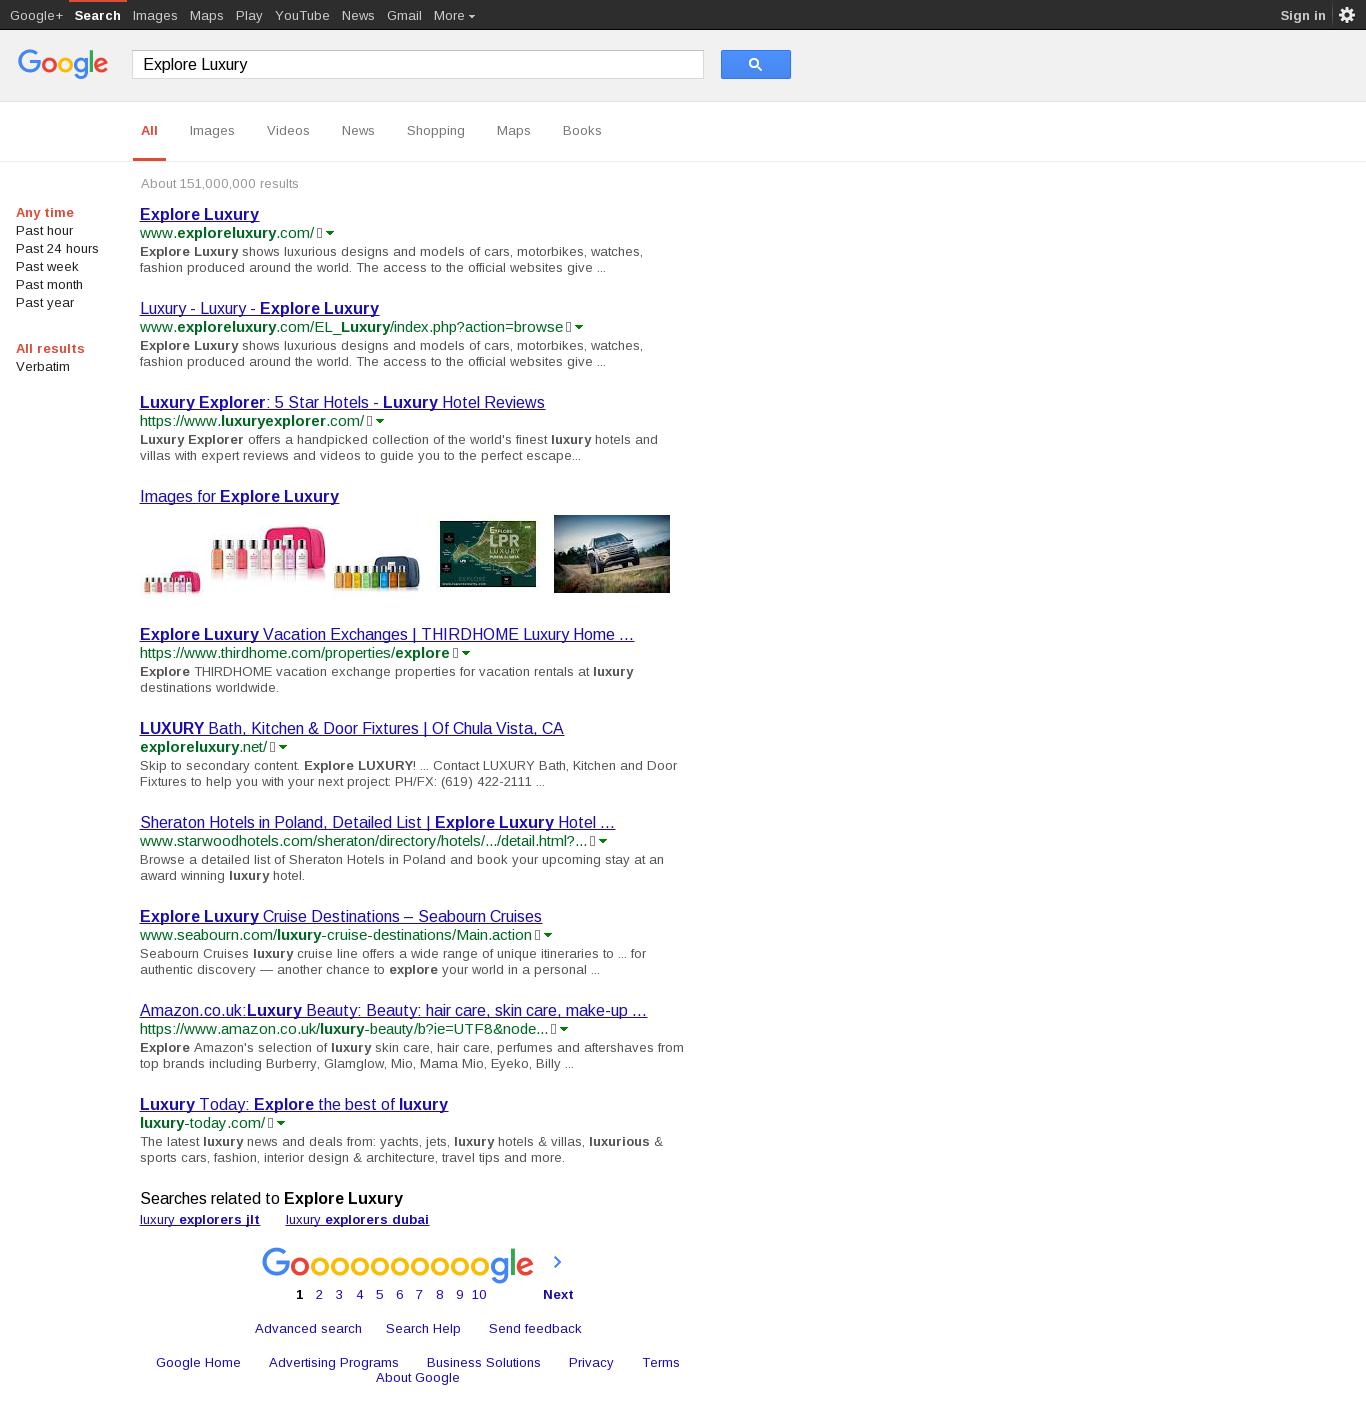 exploreluxury com - Explore Luxury - DomainsData